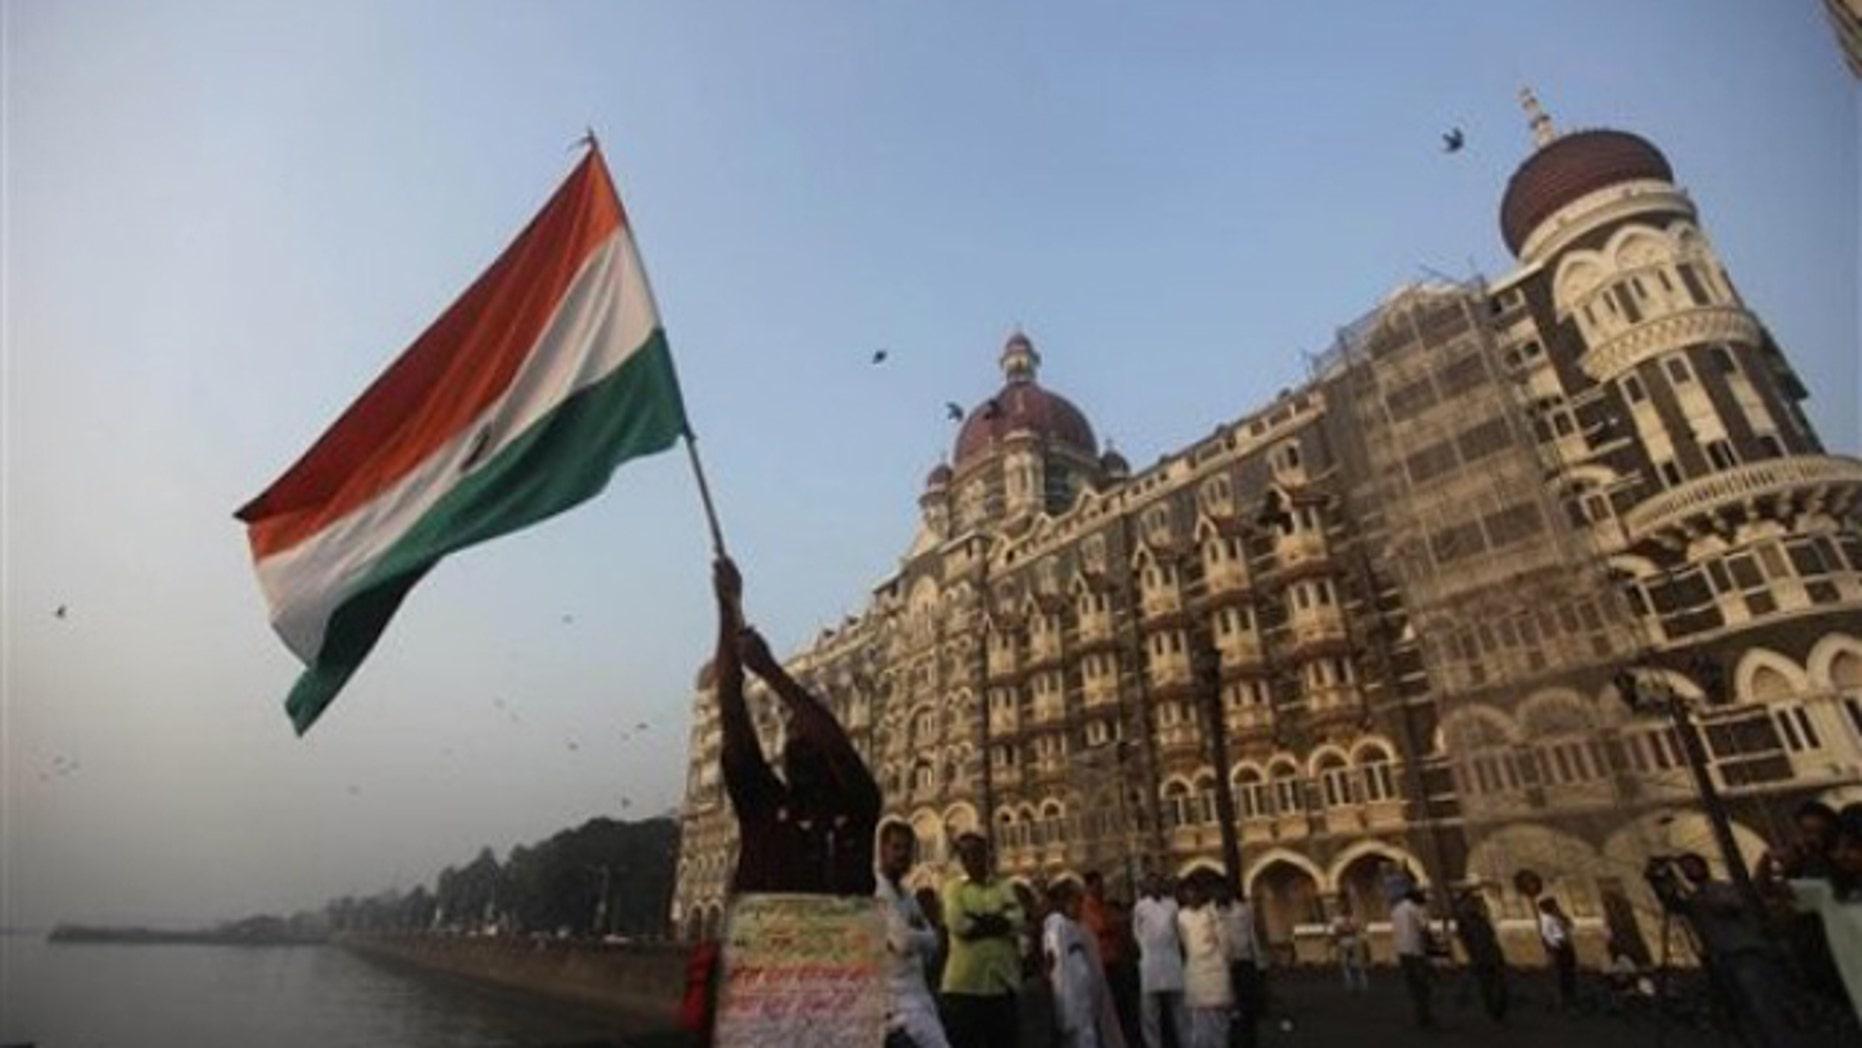 In this Nov. 26, 2009, file photo, a man waves an Indian flag outside the Taj Mahal hotel in Mumbai, India. (AP Photo)